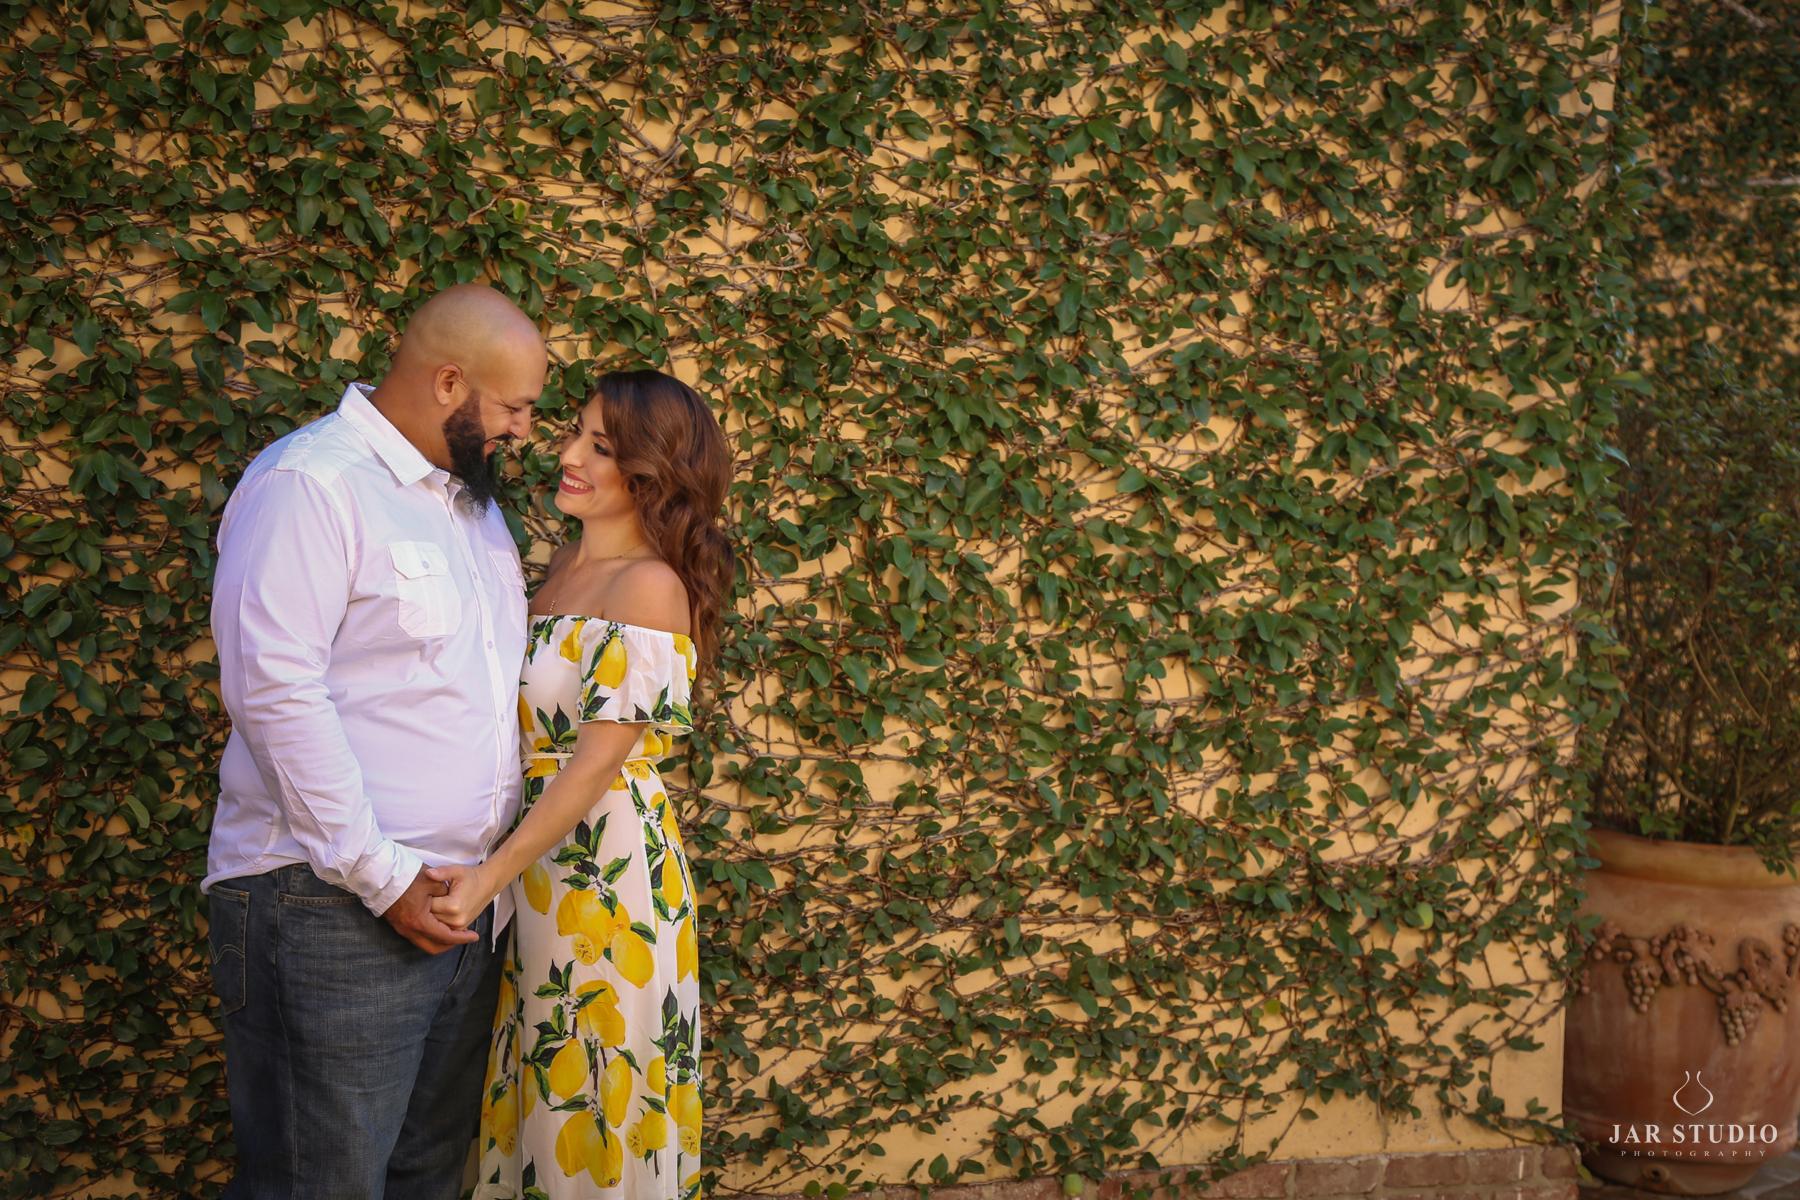 07-bellacollina-orlando-wedding-photography-jarstudio.jpg